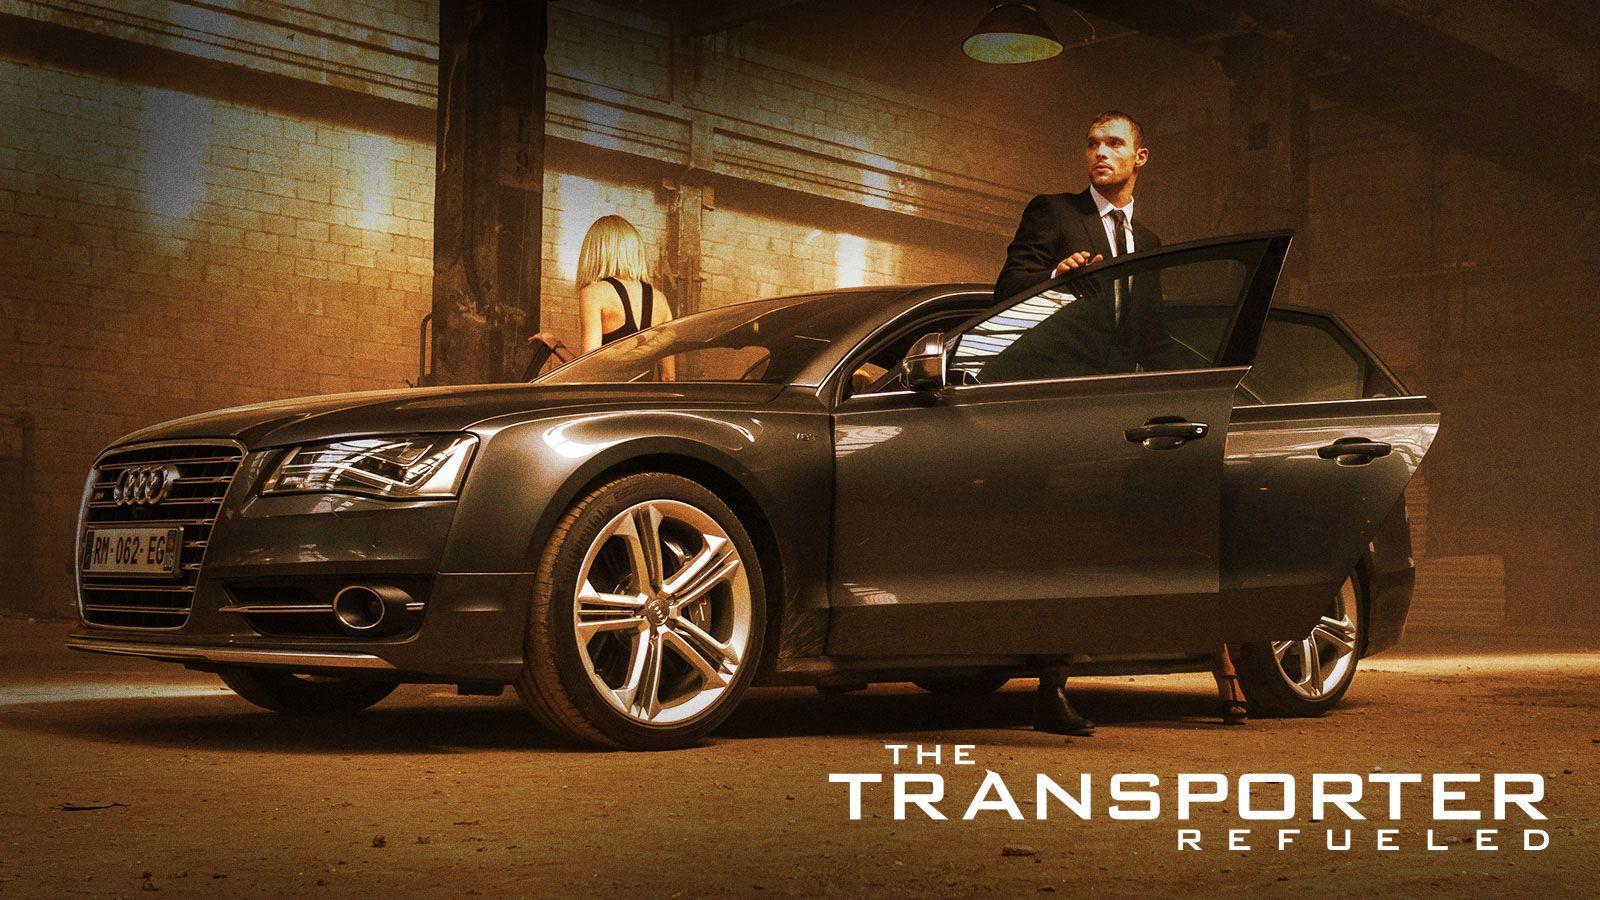 transporter refueled full movie download utorrent